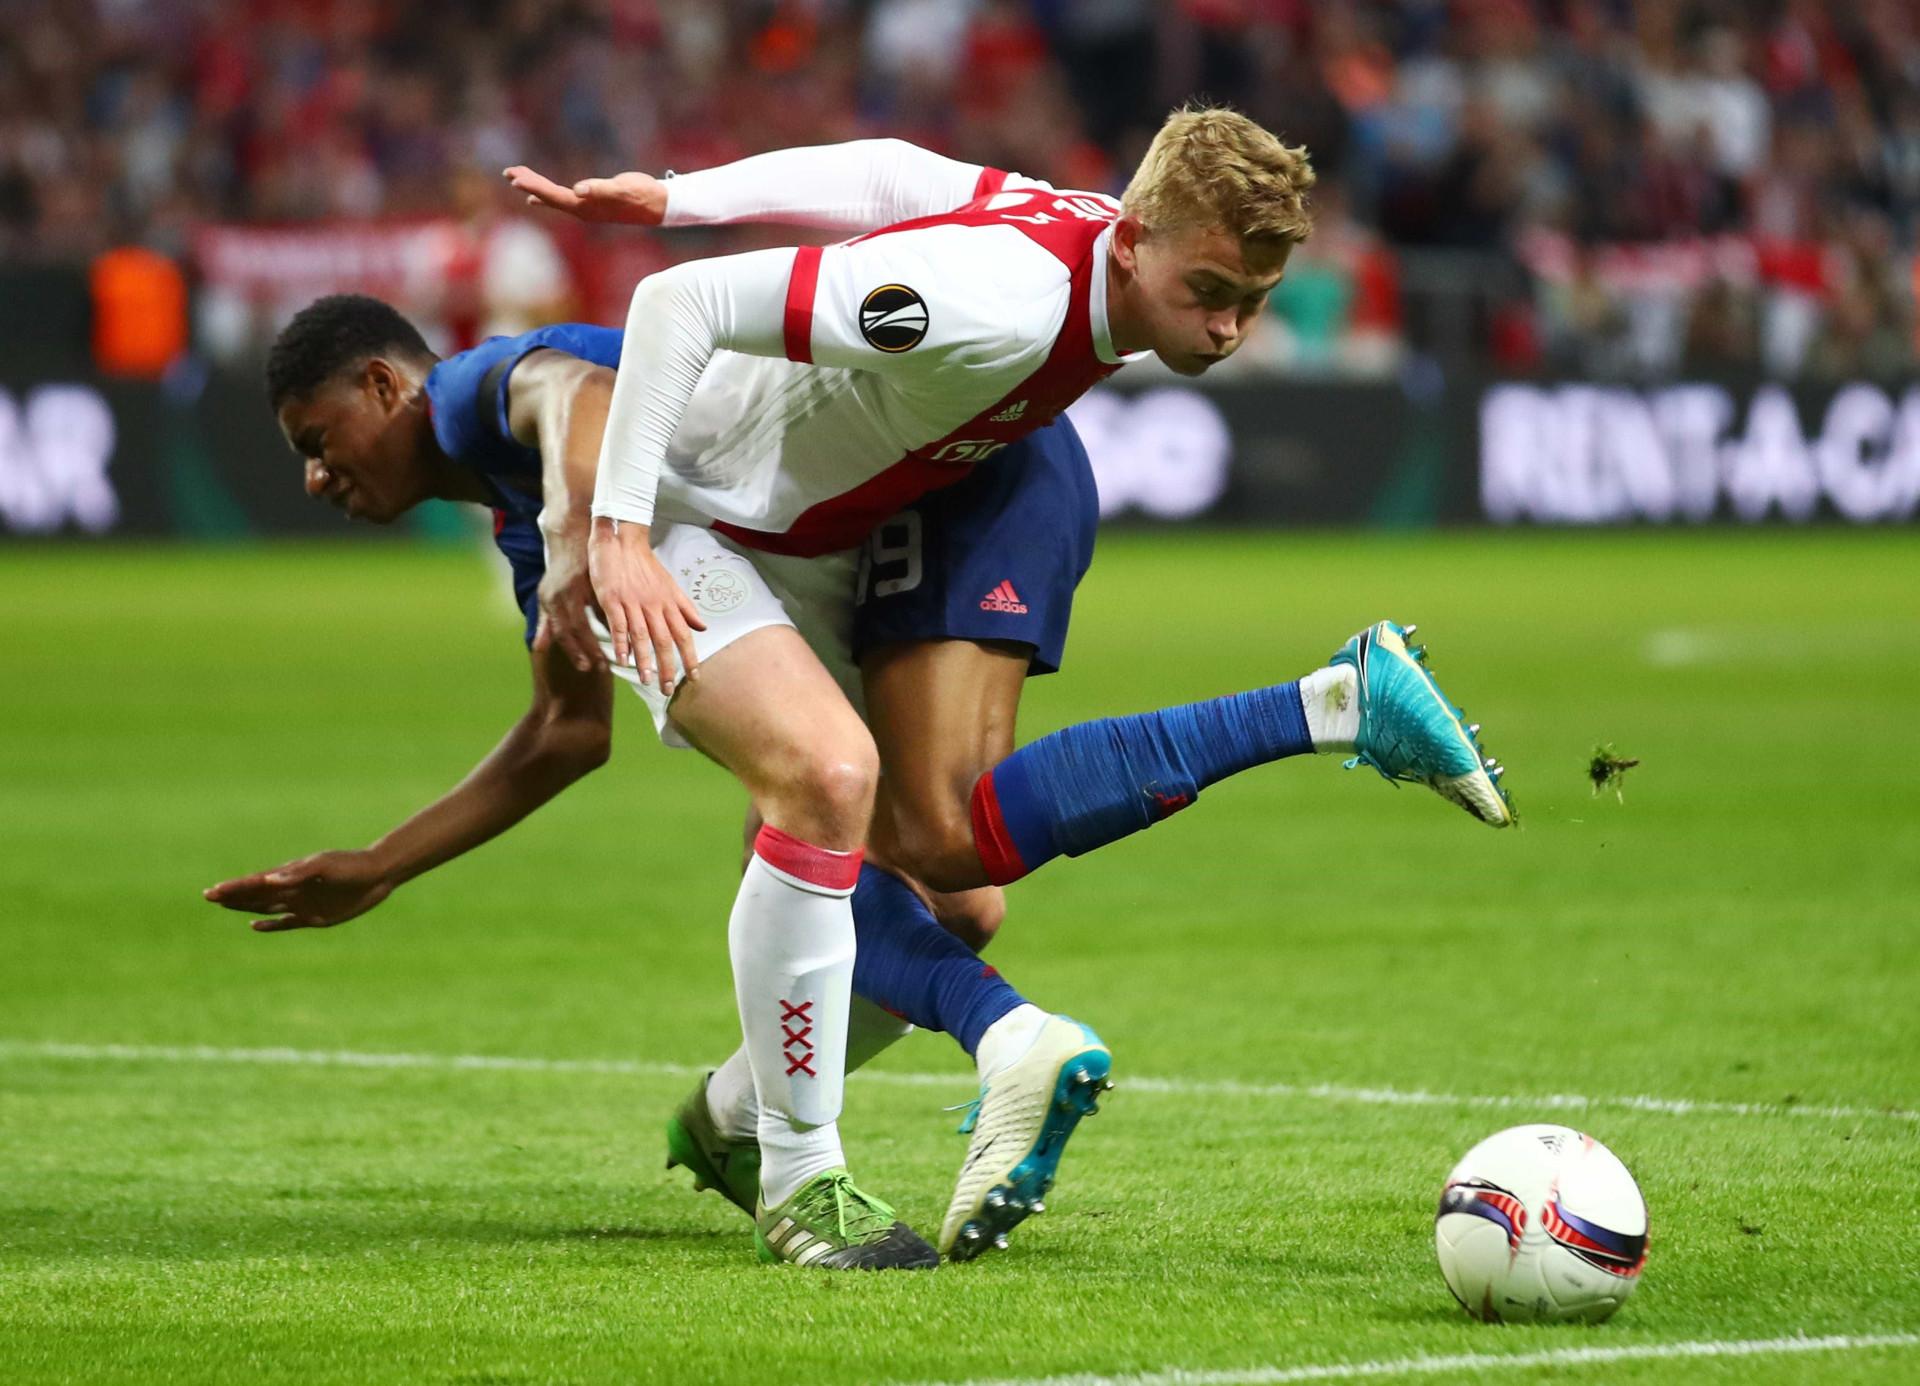 Crise na defesa leva Barcelona a referenciar 11 jogadores